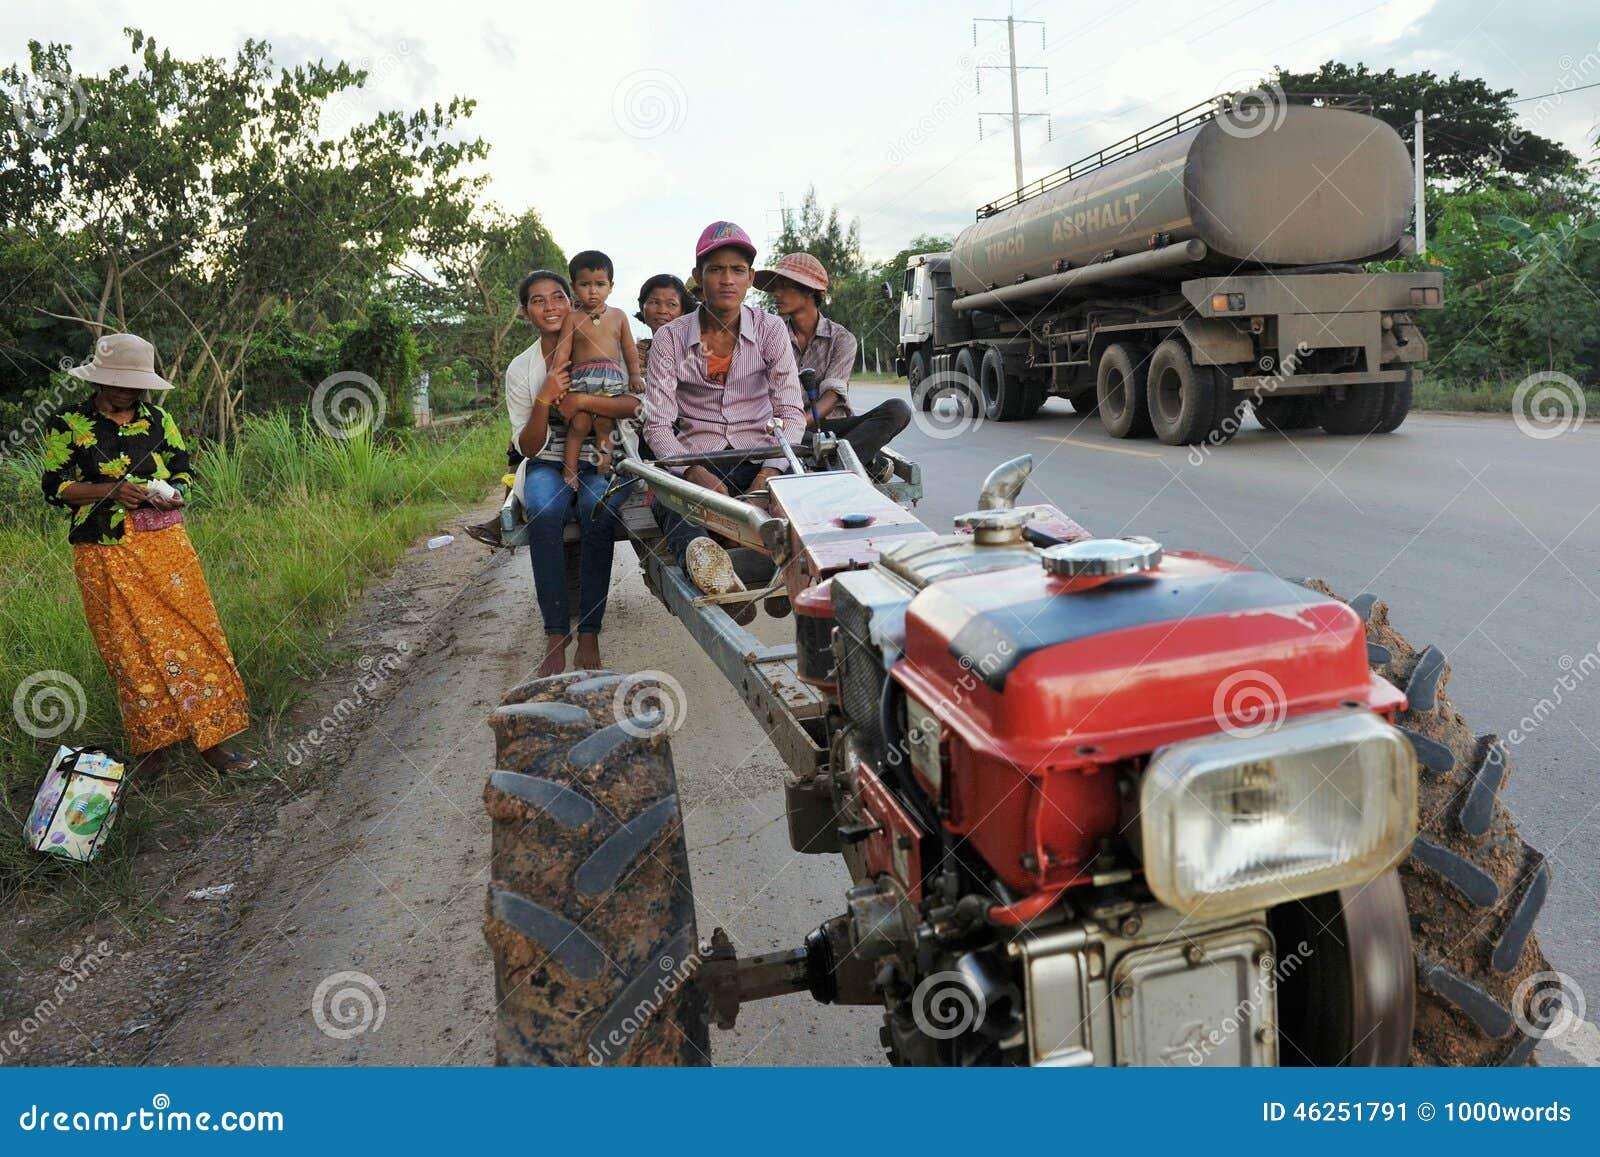 Tractor Wheel Person : Tractor public transport editorial photo image